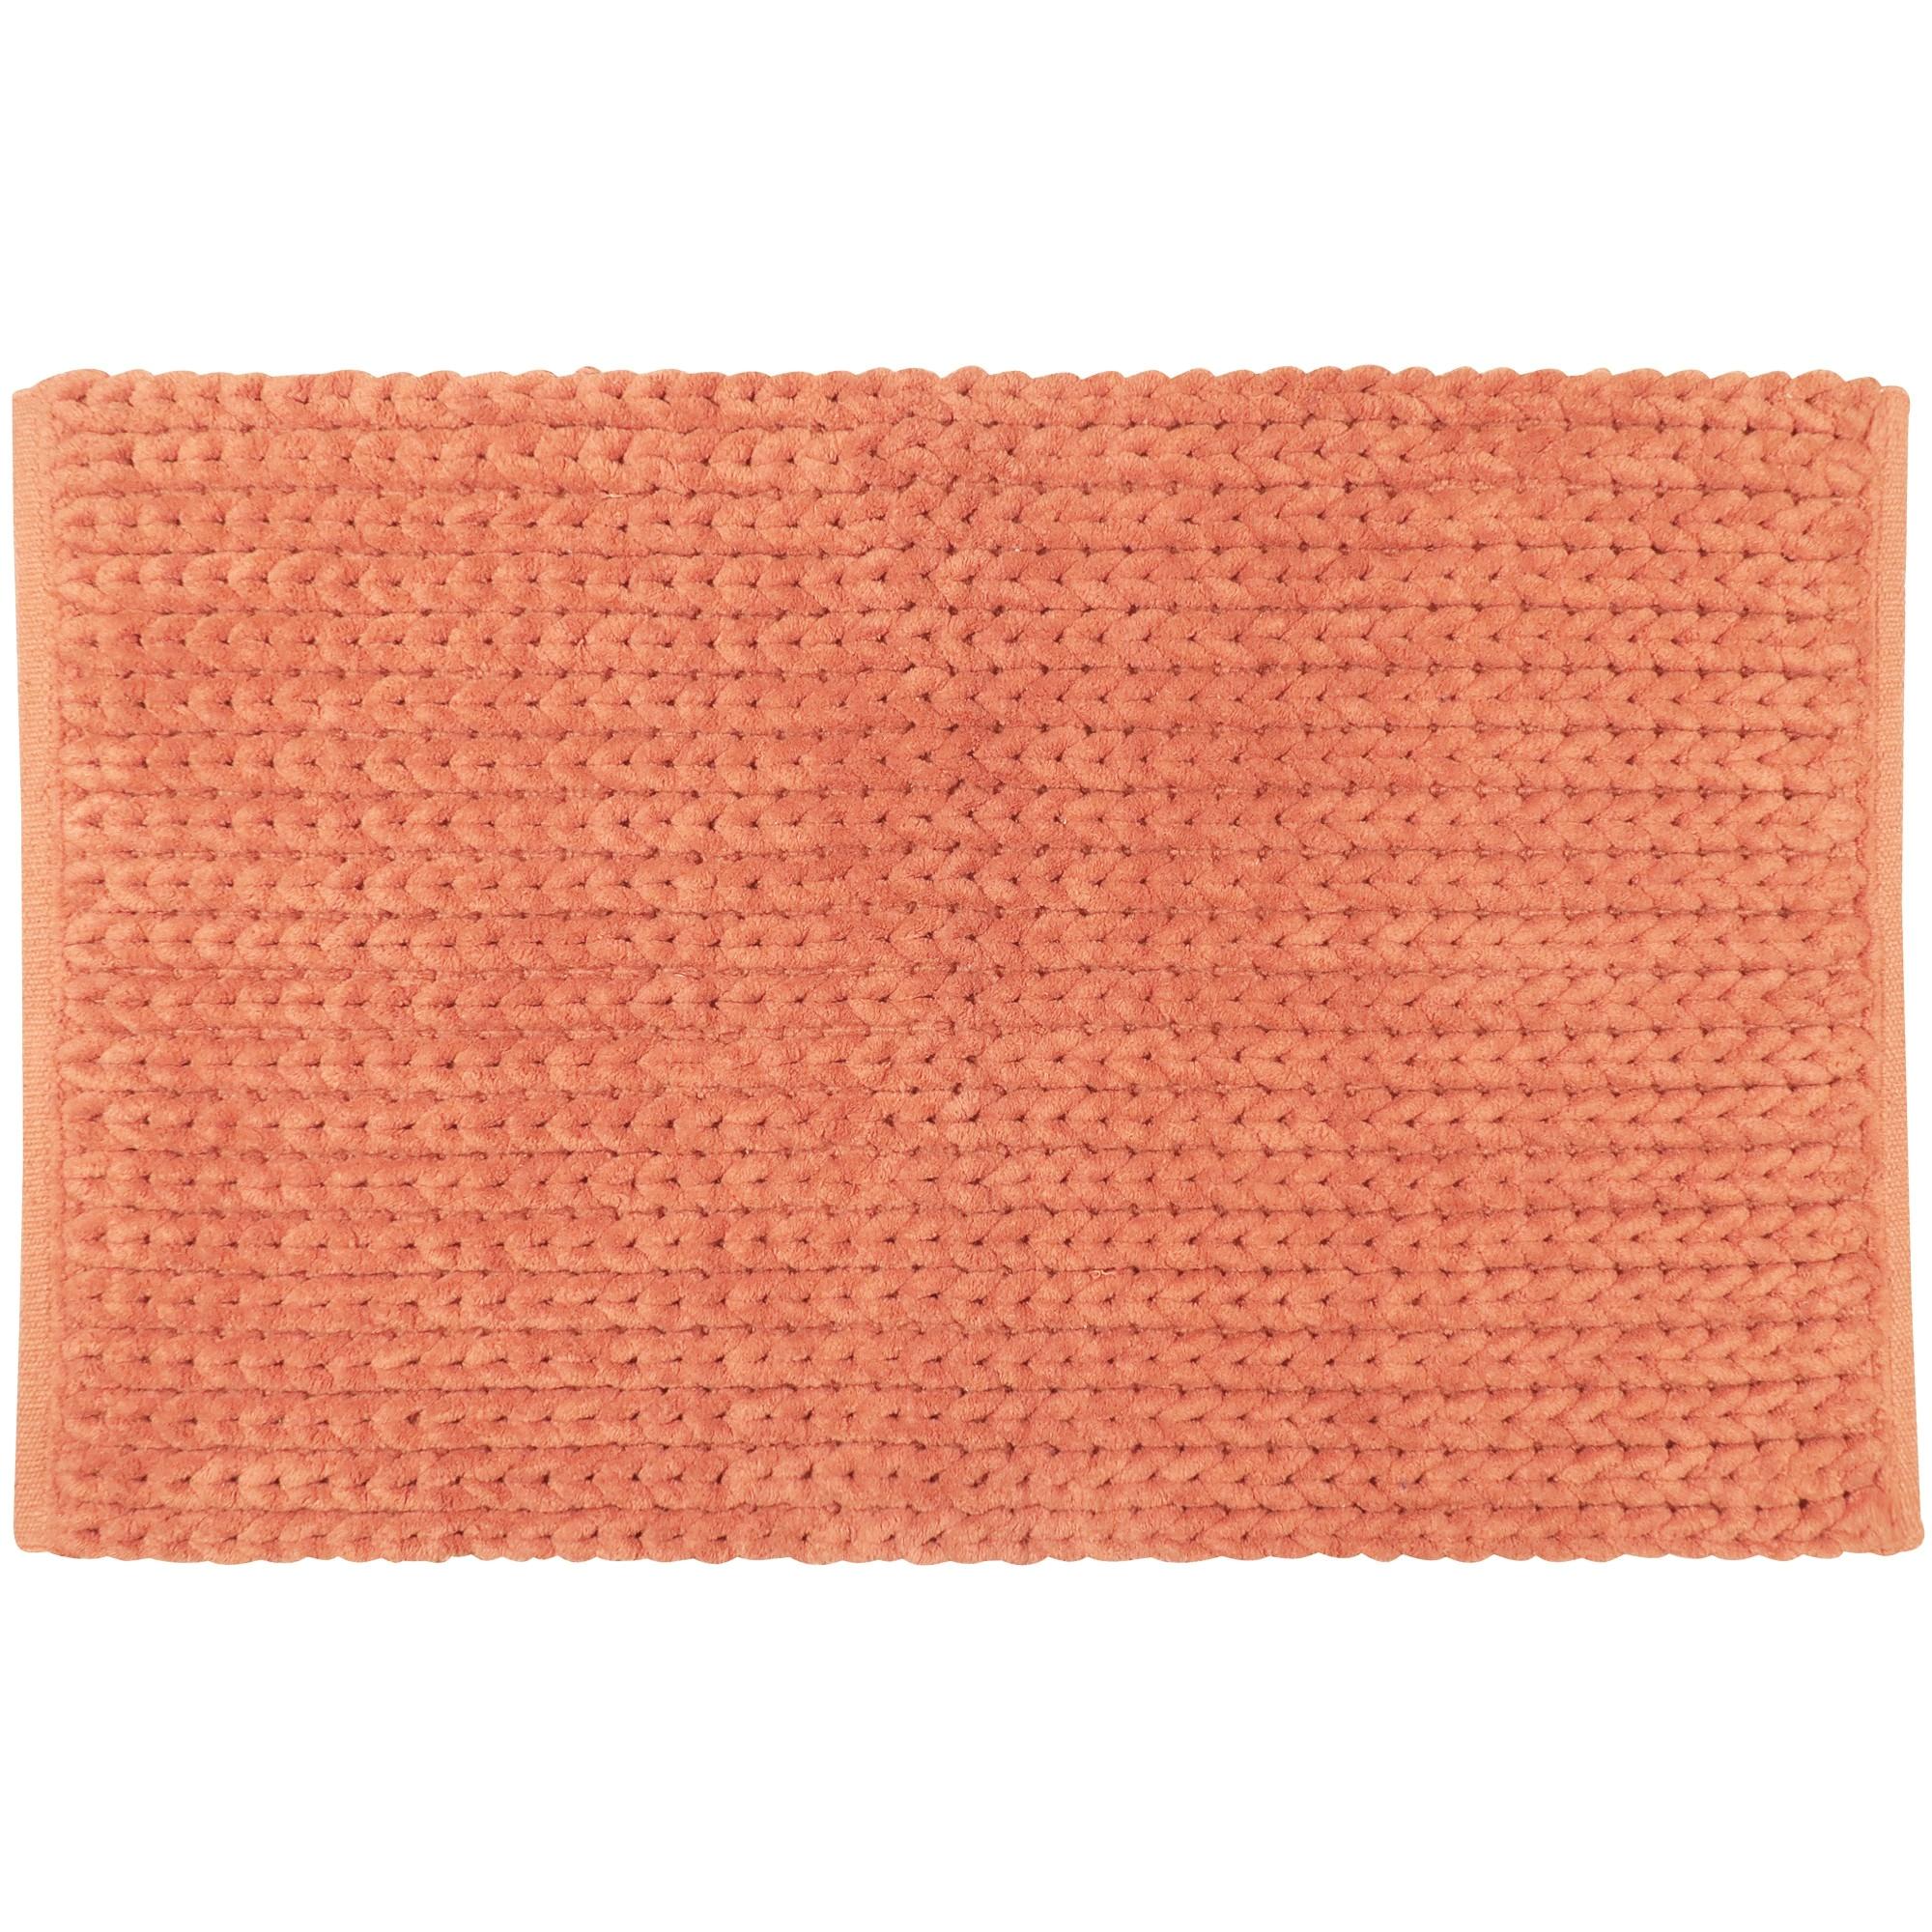 macys bathroomgs bath towels quick dry target jc penney penneys walmart fieldcrest